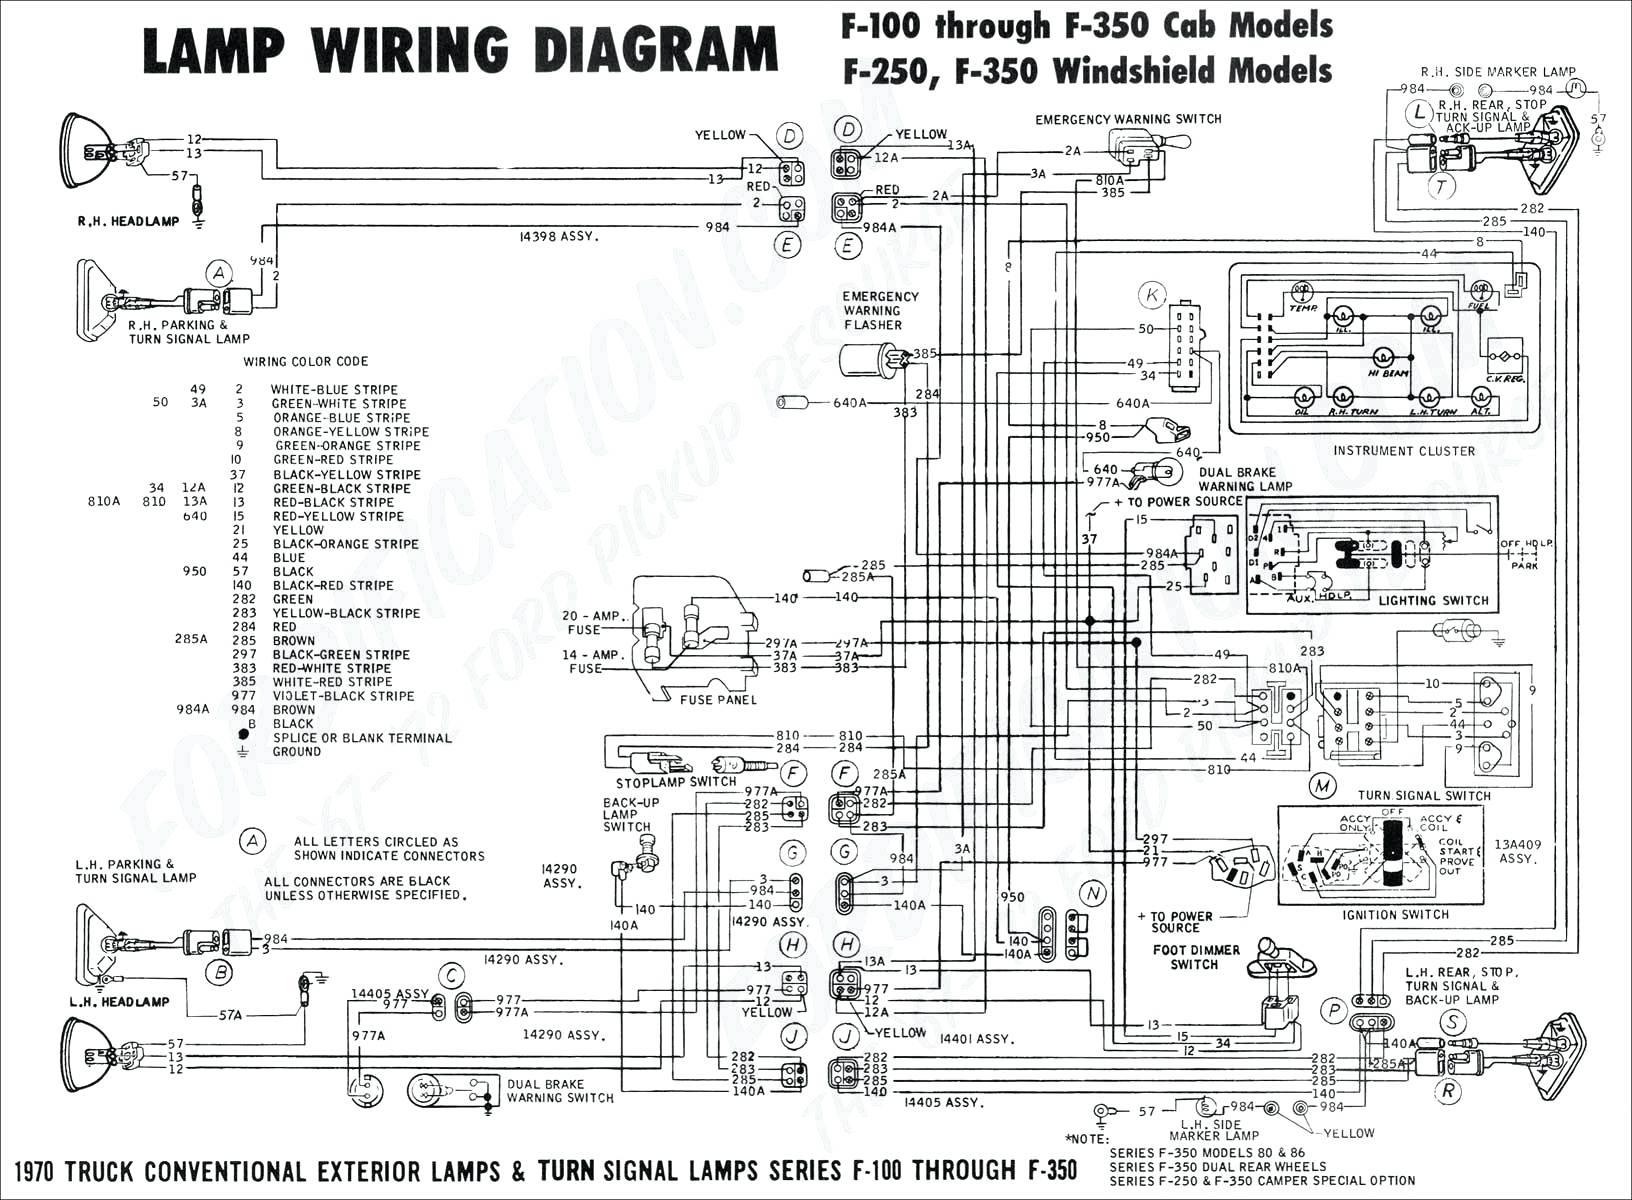 eaton c25bnb230a wiring diagram Download-Hkfz Wiring Diagram Sample Wiring Diagram Sample Eaton c25bnb230a wiring diagram 3-b